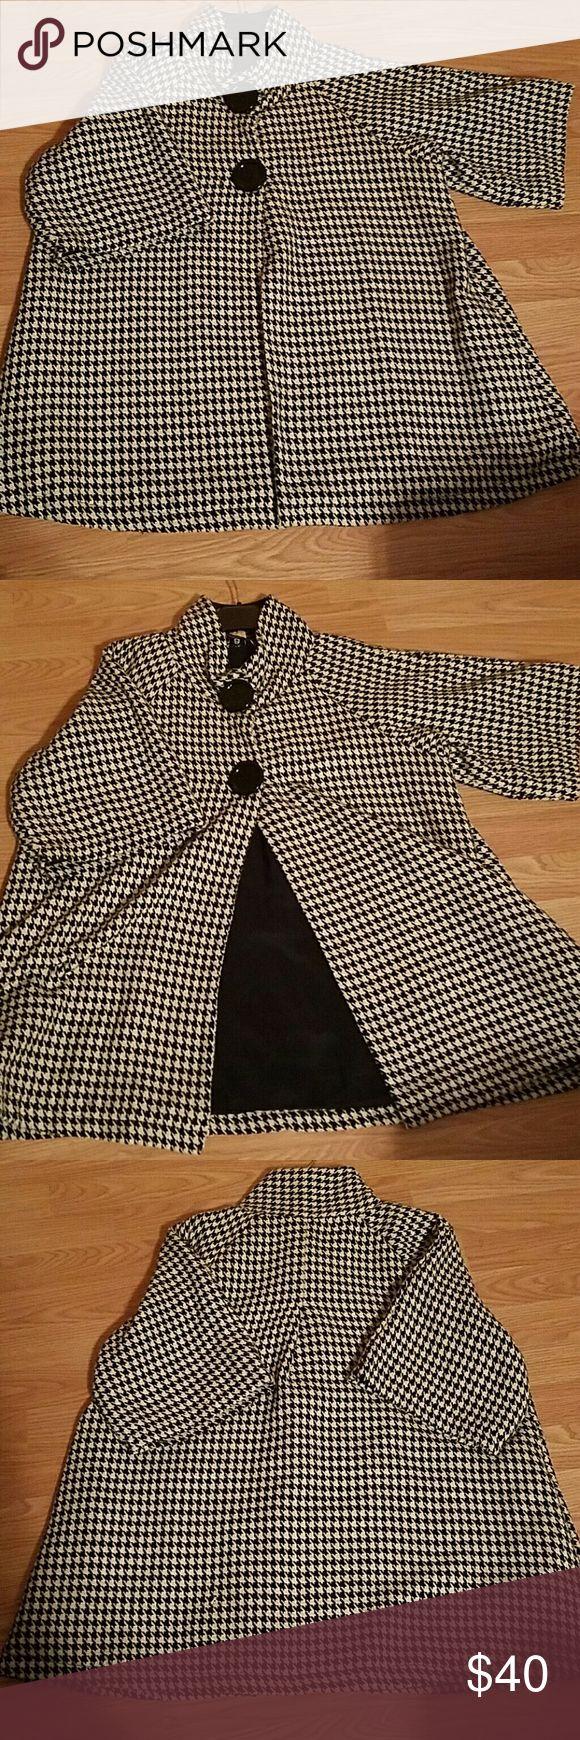 Ladies Houndstooth Jacket Size XL Ladies Houndstooth Jacket Size XL, black and white,  short sleeve, 55% wool, made in India Keren Hart Jackets & Coats